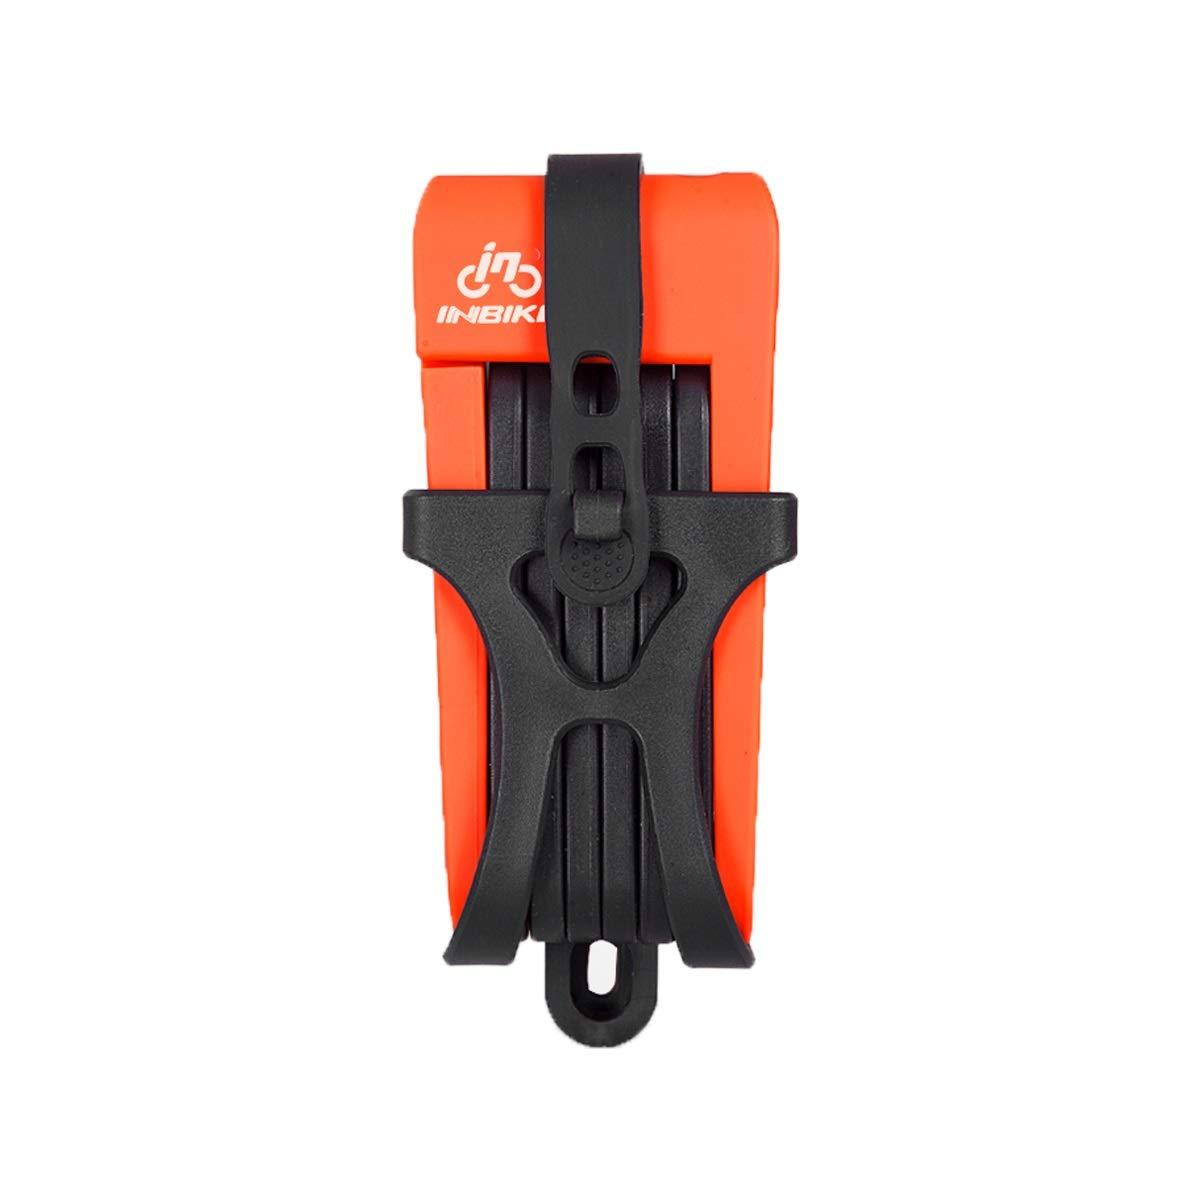 ZHONGYUE Mountain Bike Bicycle Joint Folding Anti-Theft Lock, Bicycle Lock, Electric Bicycle Equipment Accessories, Black, Blue, Orange (Color : Orange)